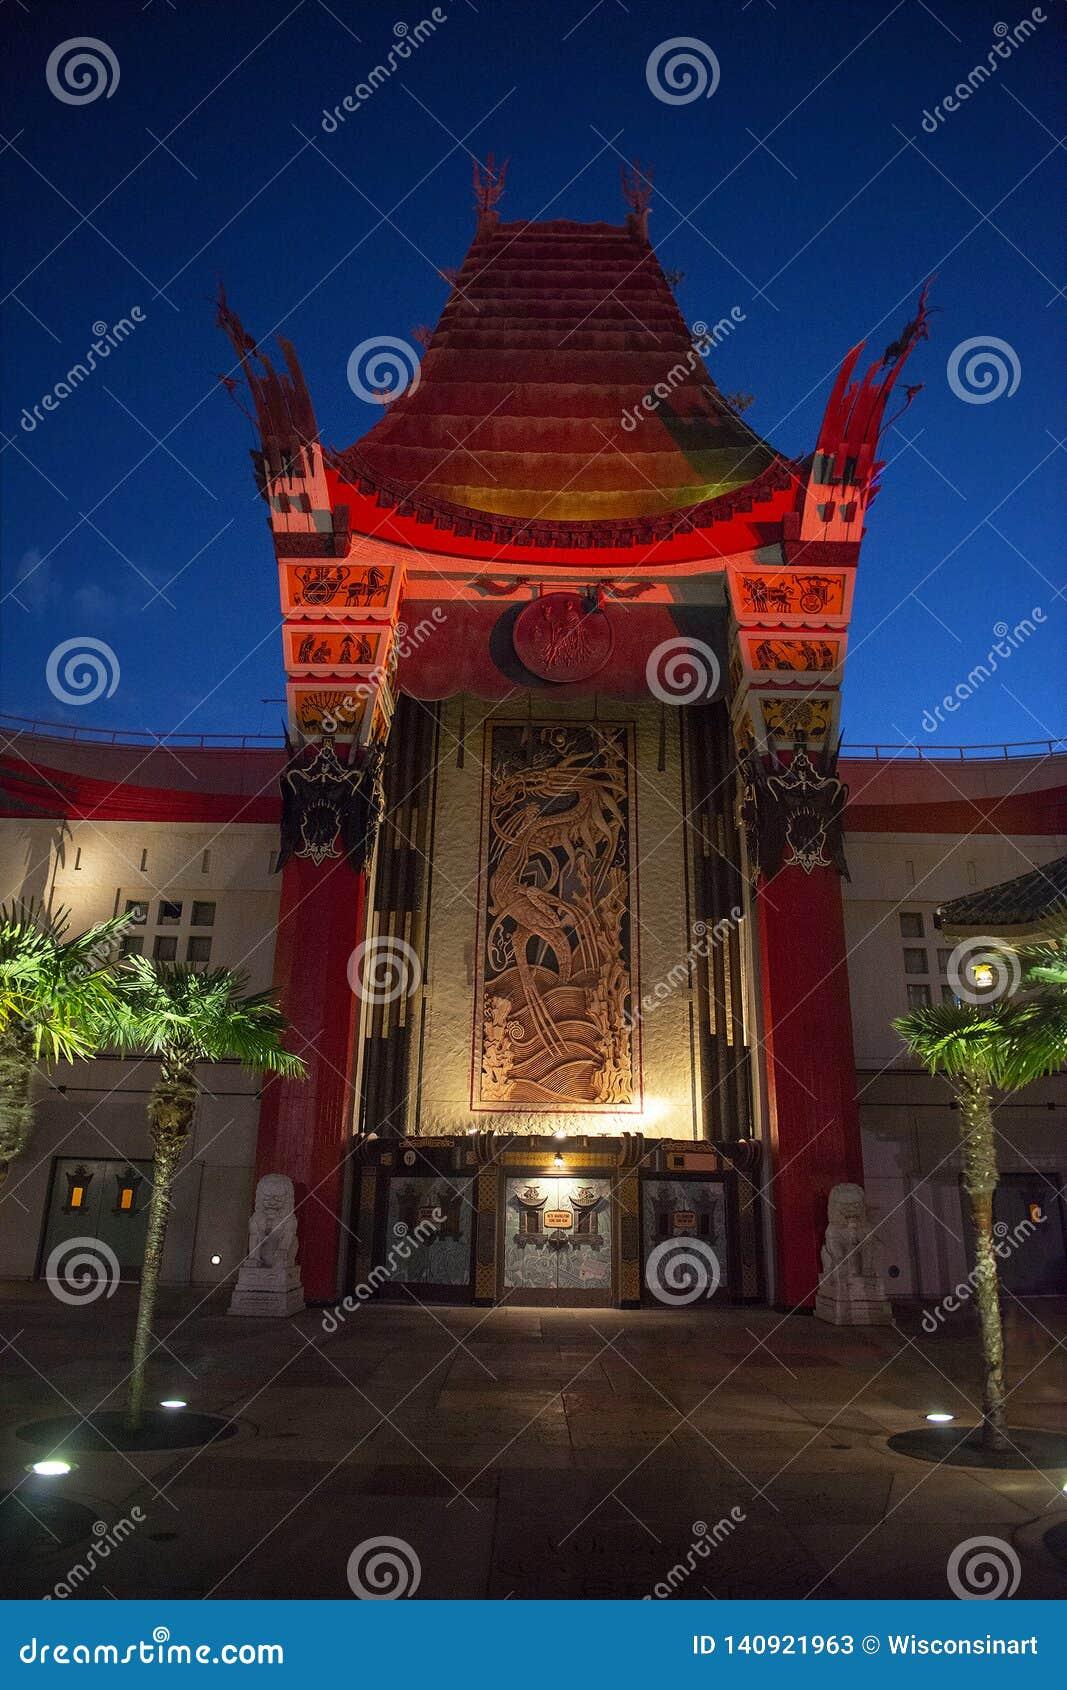 Disney World, studi di Hollywood, teatro cinese